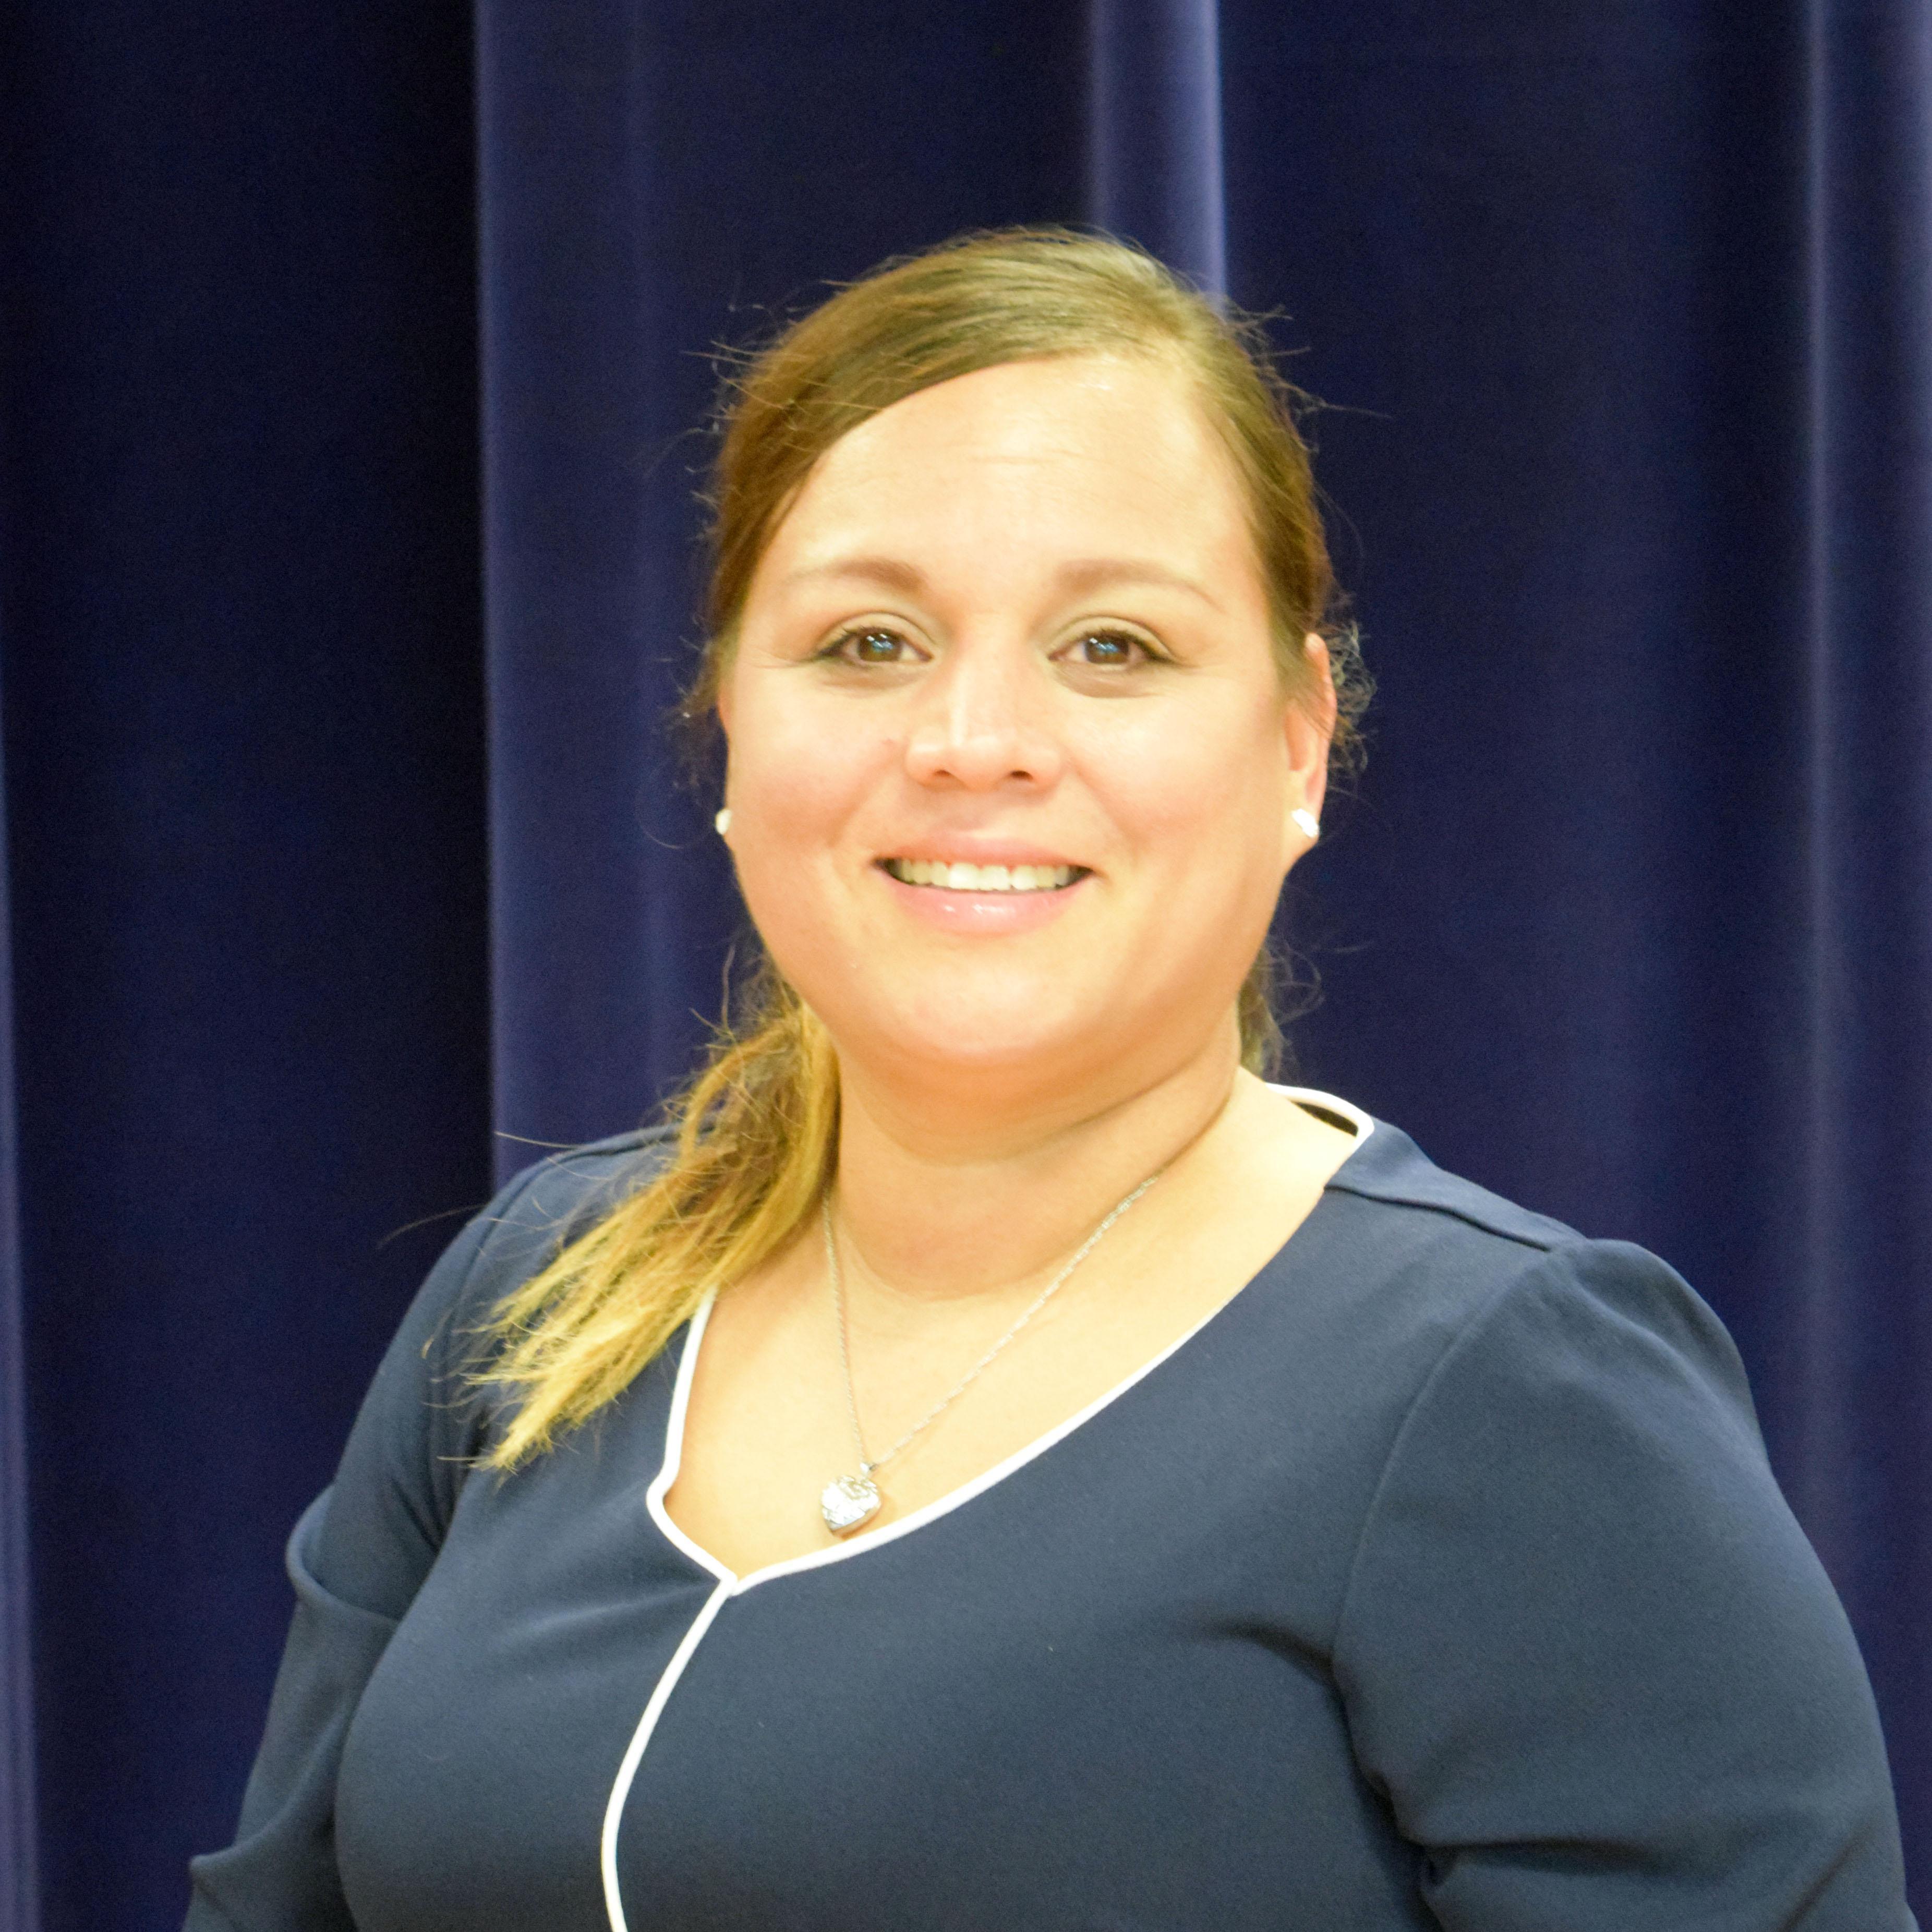 Ellie Perez, M.Ed.'s Profile Photo